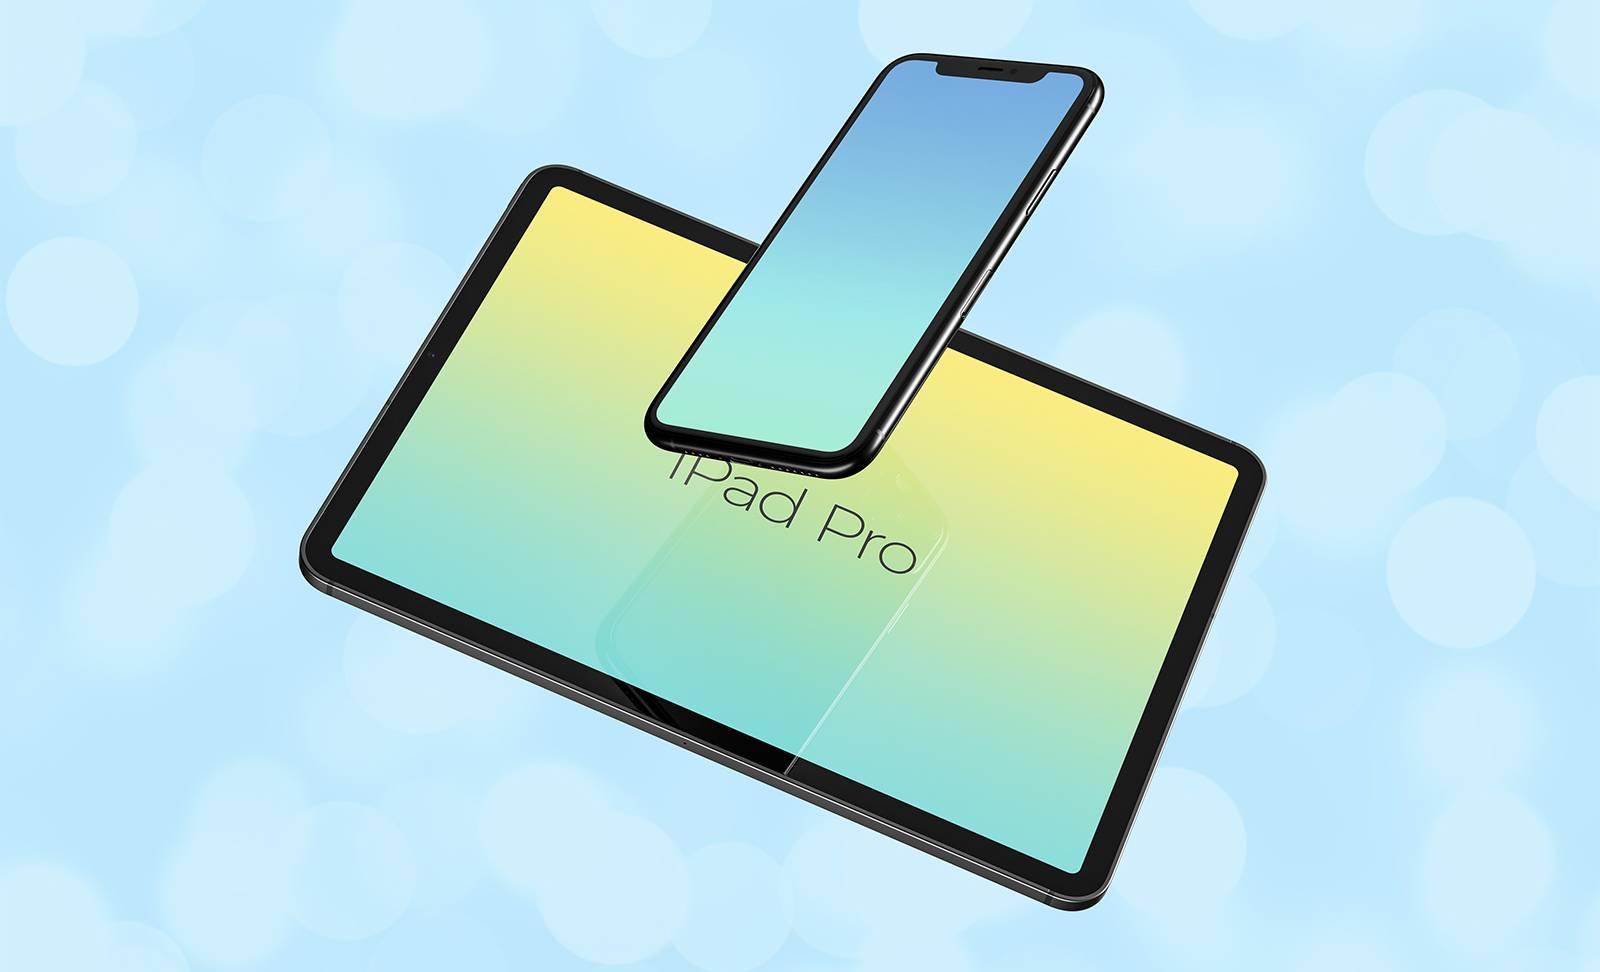 iPad Pro iPhone 12 Pro senzor tof